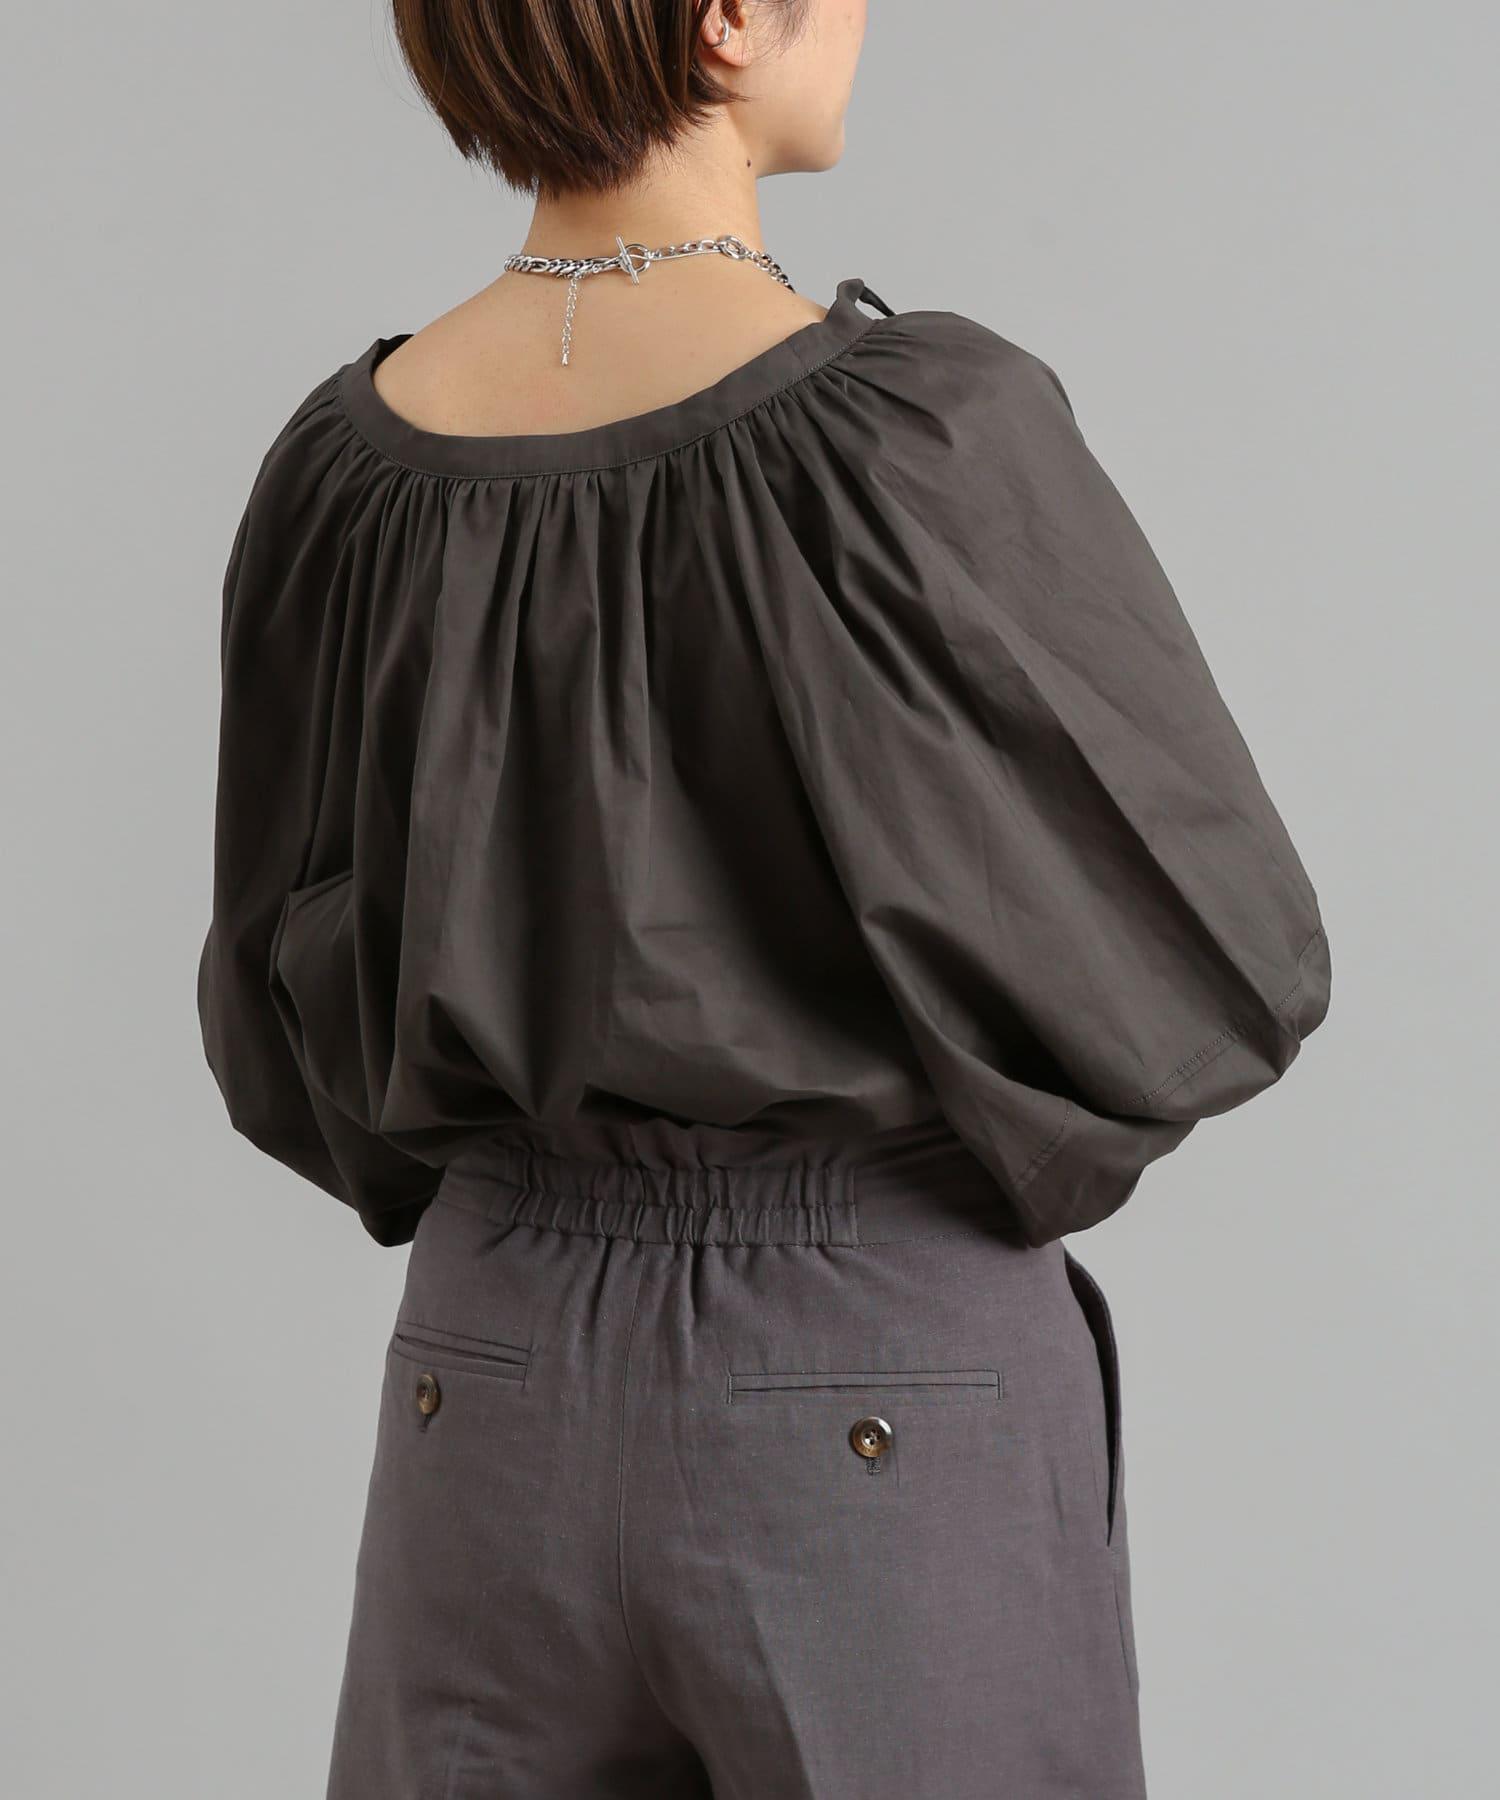 DOUDOU(ドゥドゥ) 袖ボリューム切替5分袖ブラウス